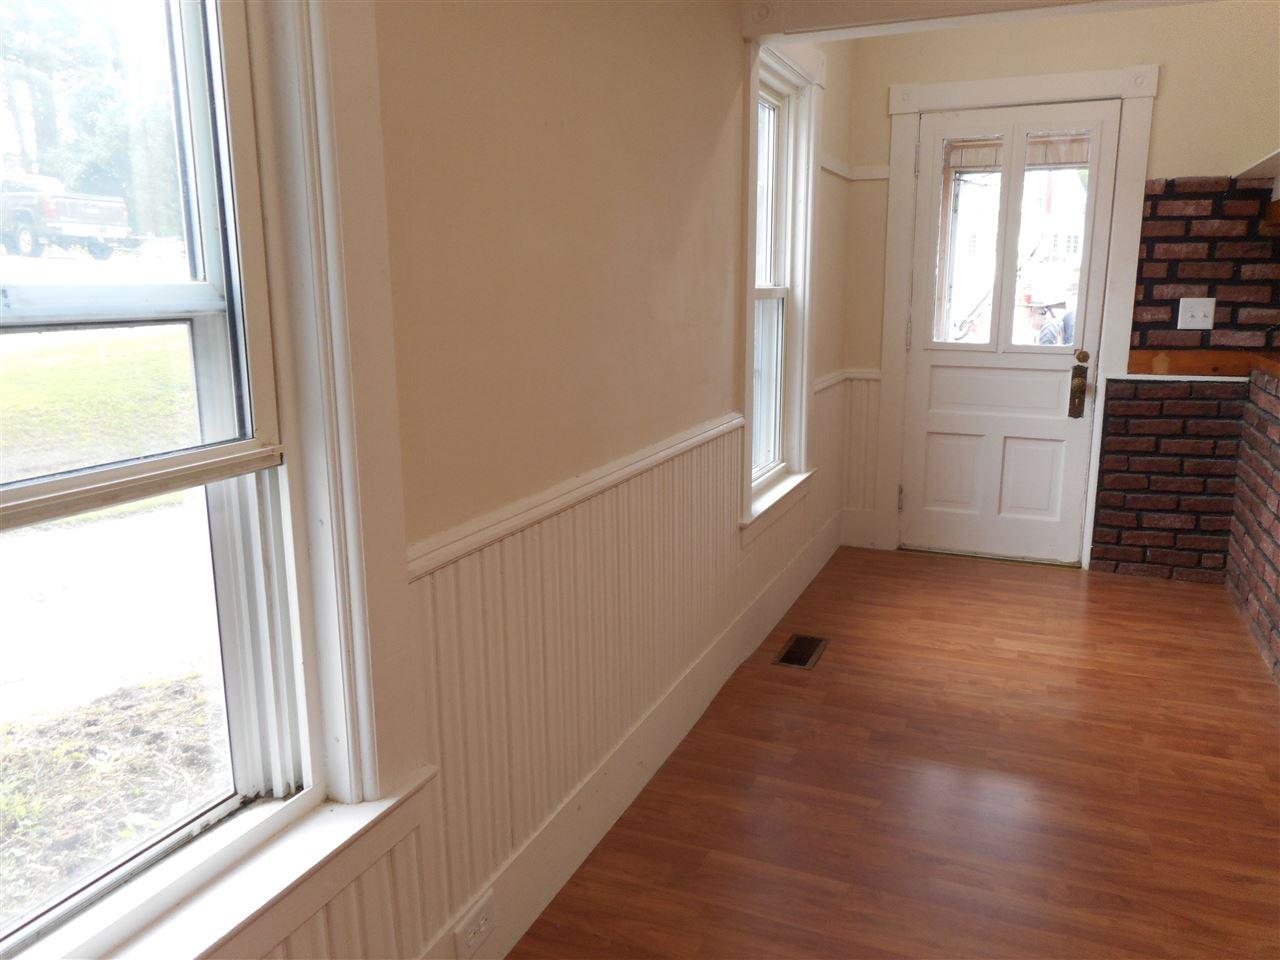 Vermont-Real-Estate-4651704-8